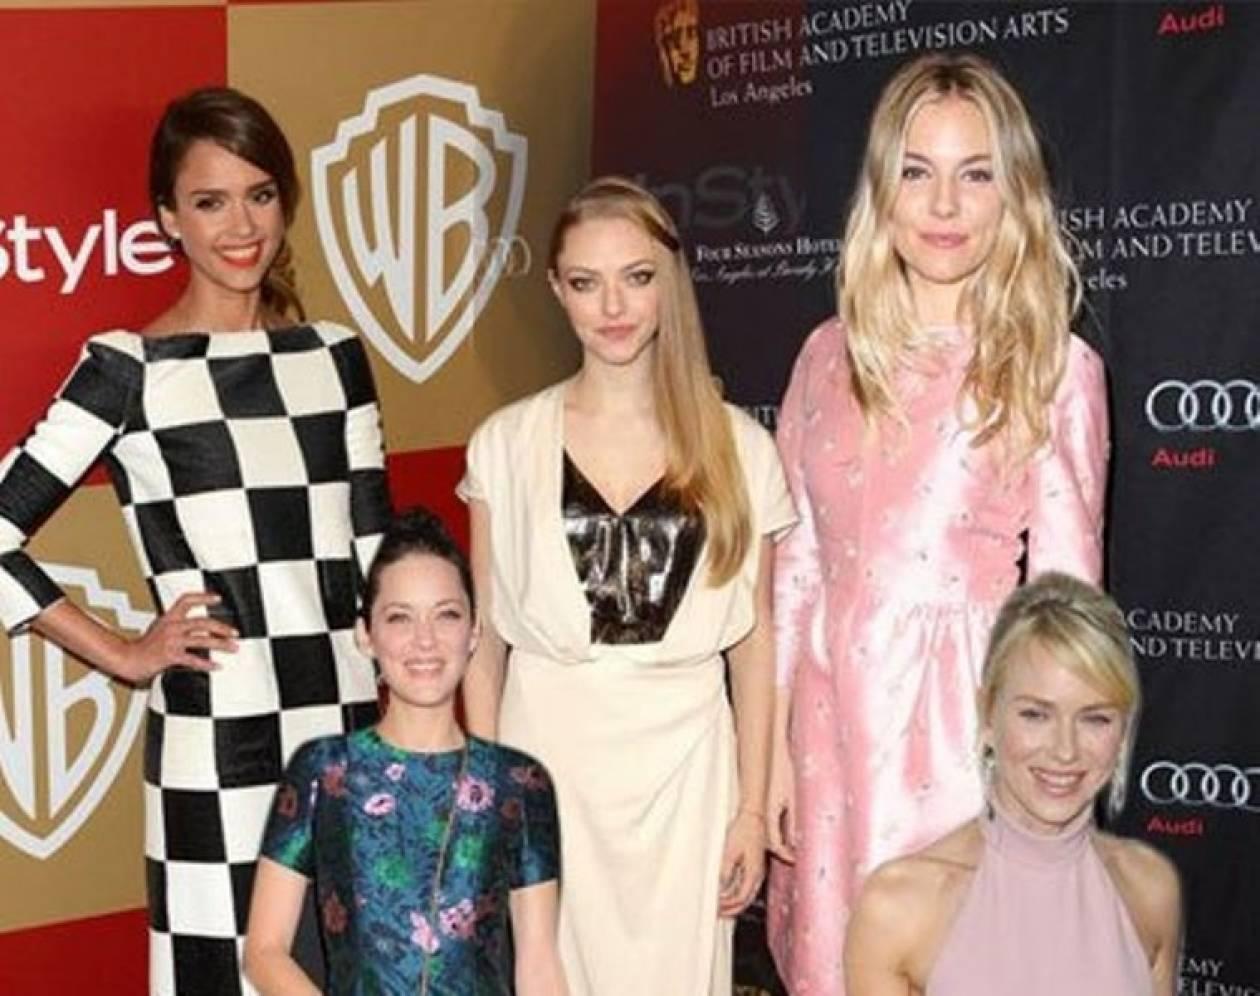 Sienna, Marion, Jessica, Naomi, Amanda: Ποια ήταν η πιο καλοντυμένη;